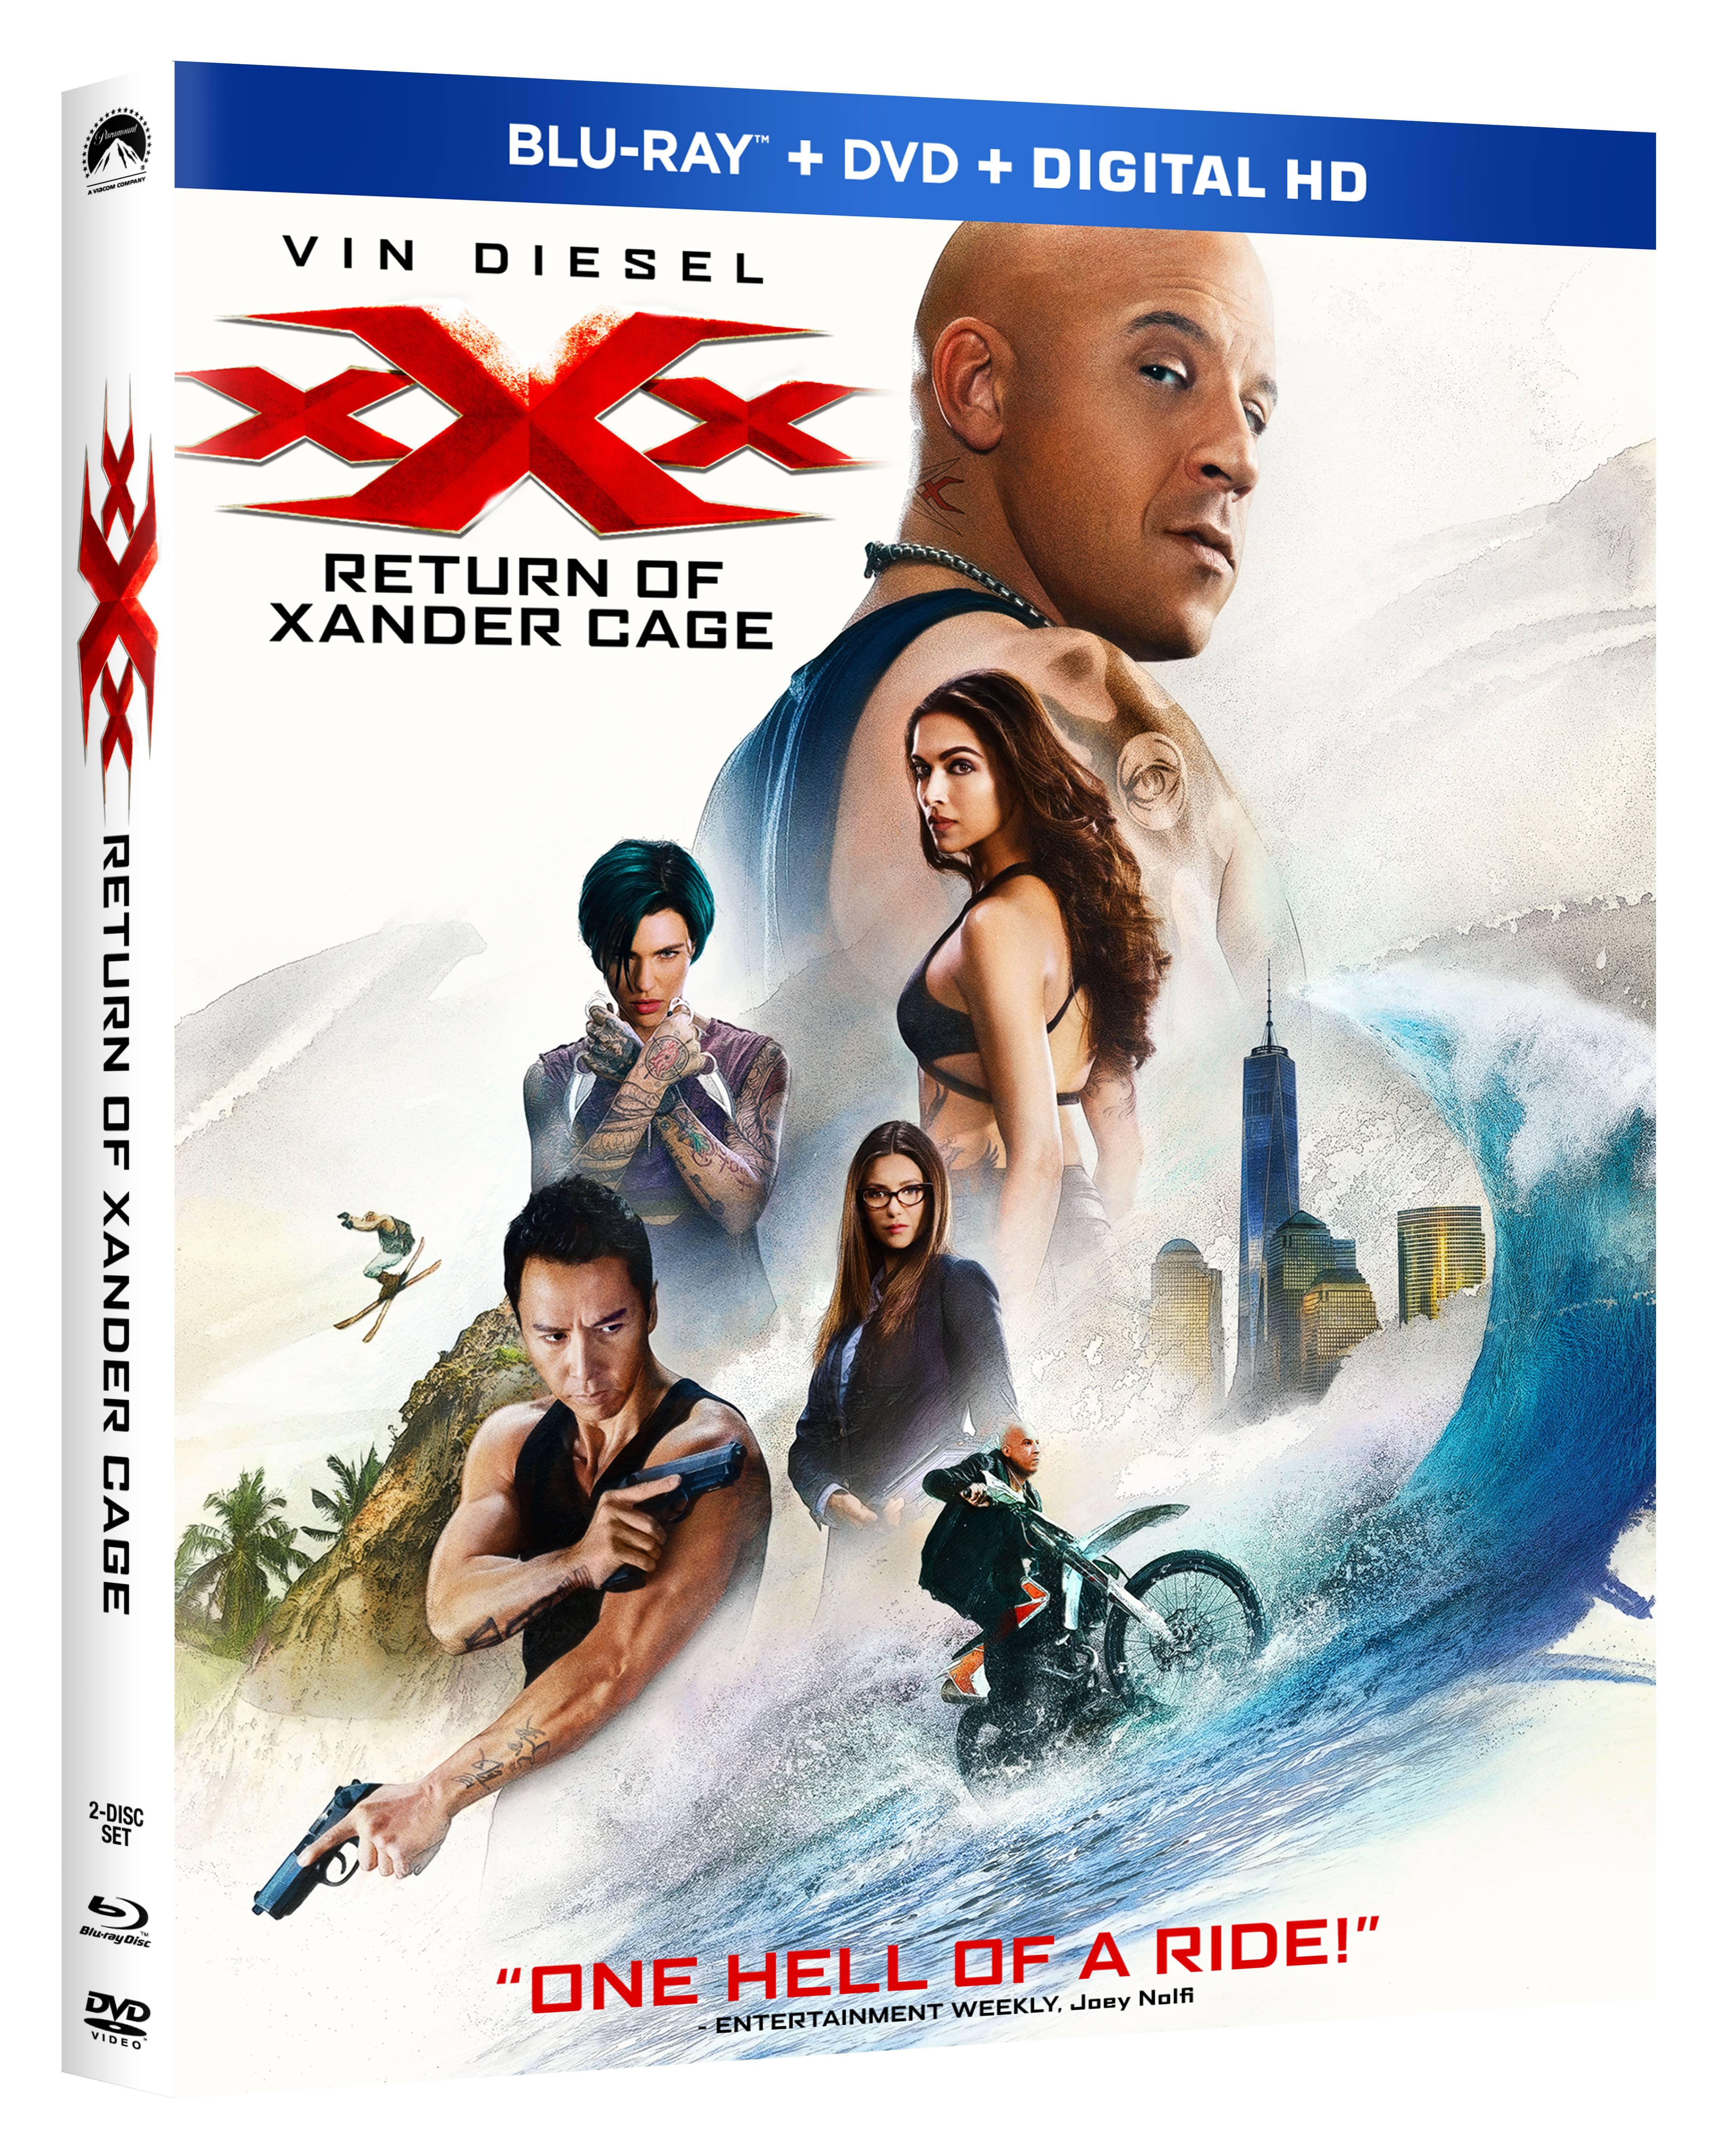 XXX RETURN OF XANDER CAGE Blu-ray